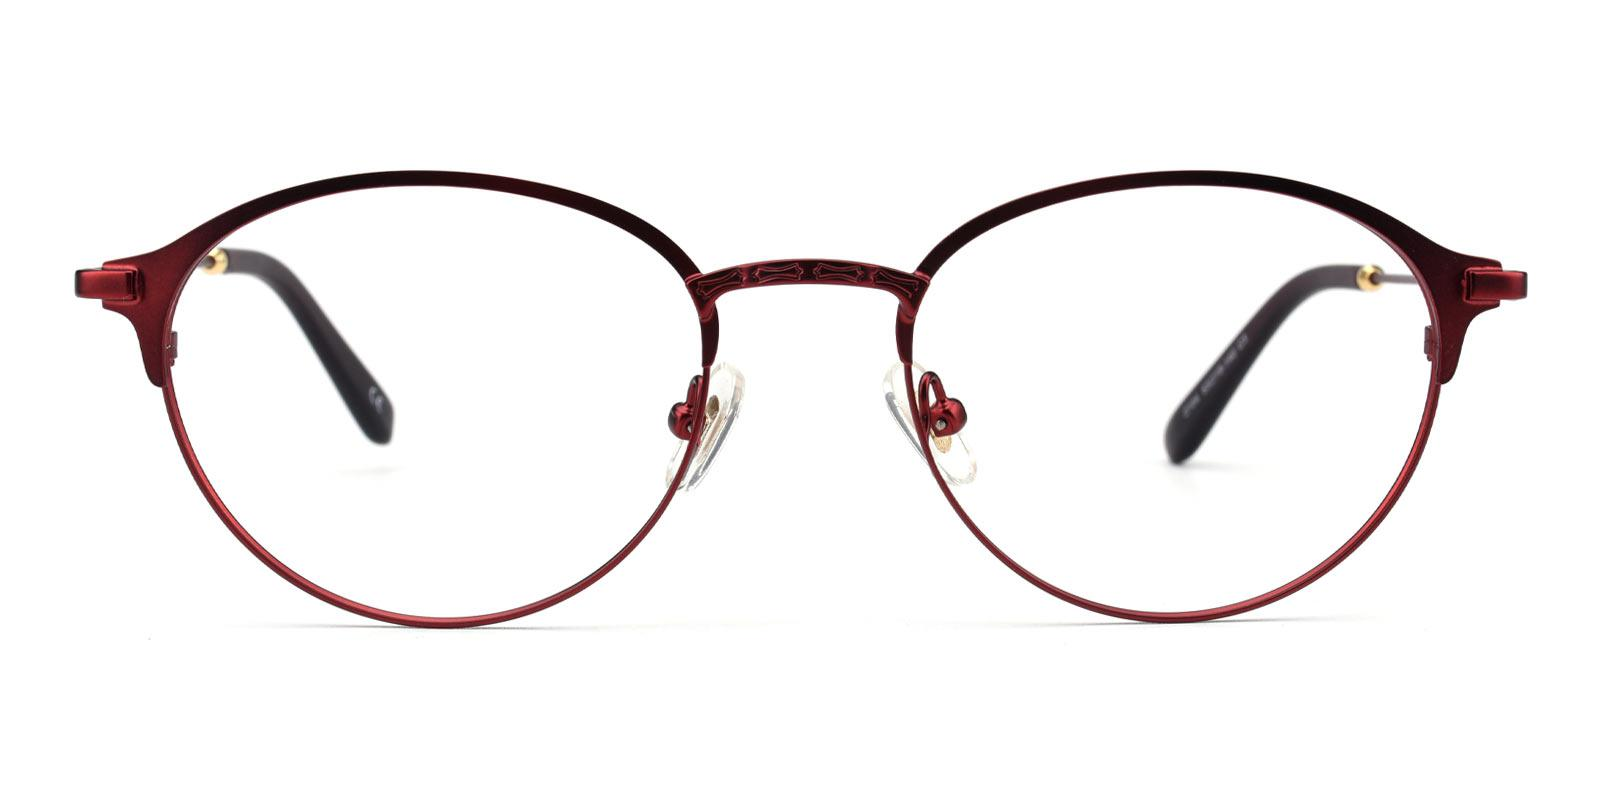 Jean-Red-Round-Metal-Eyeglasses-additional2